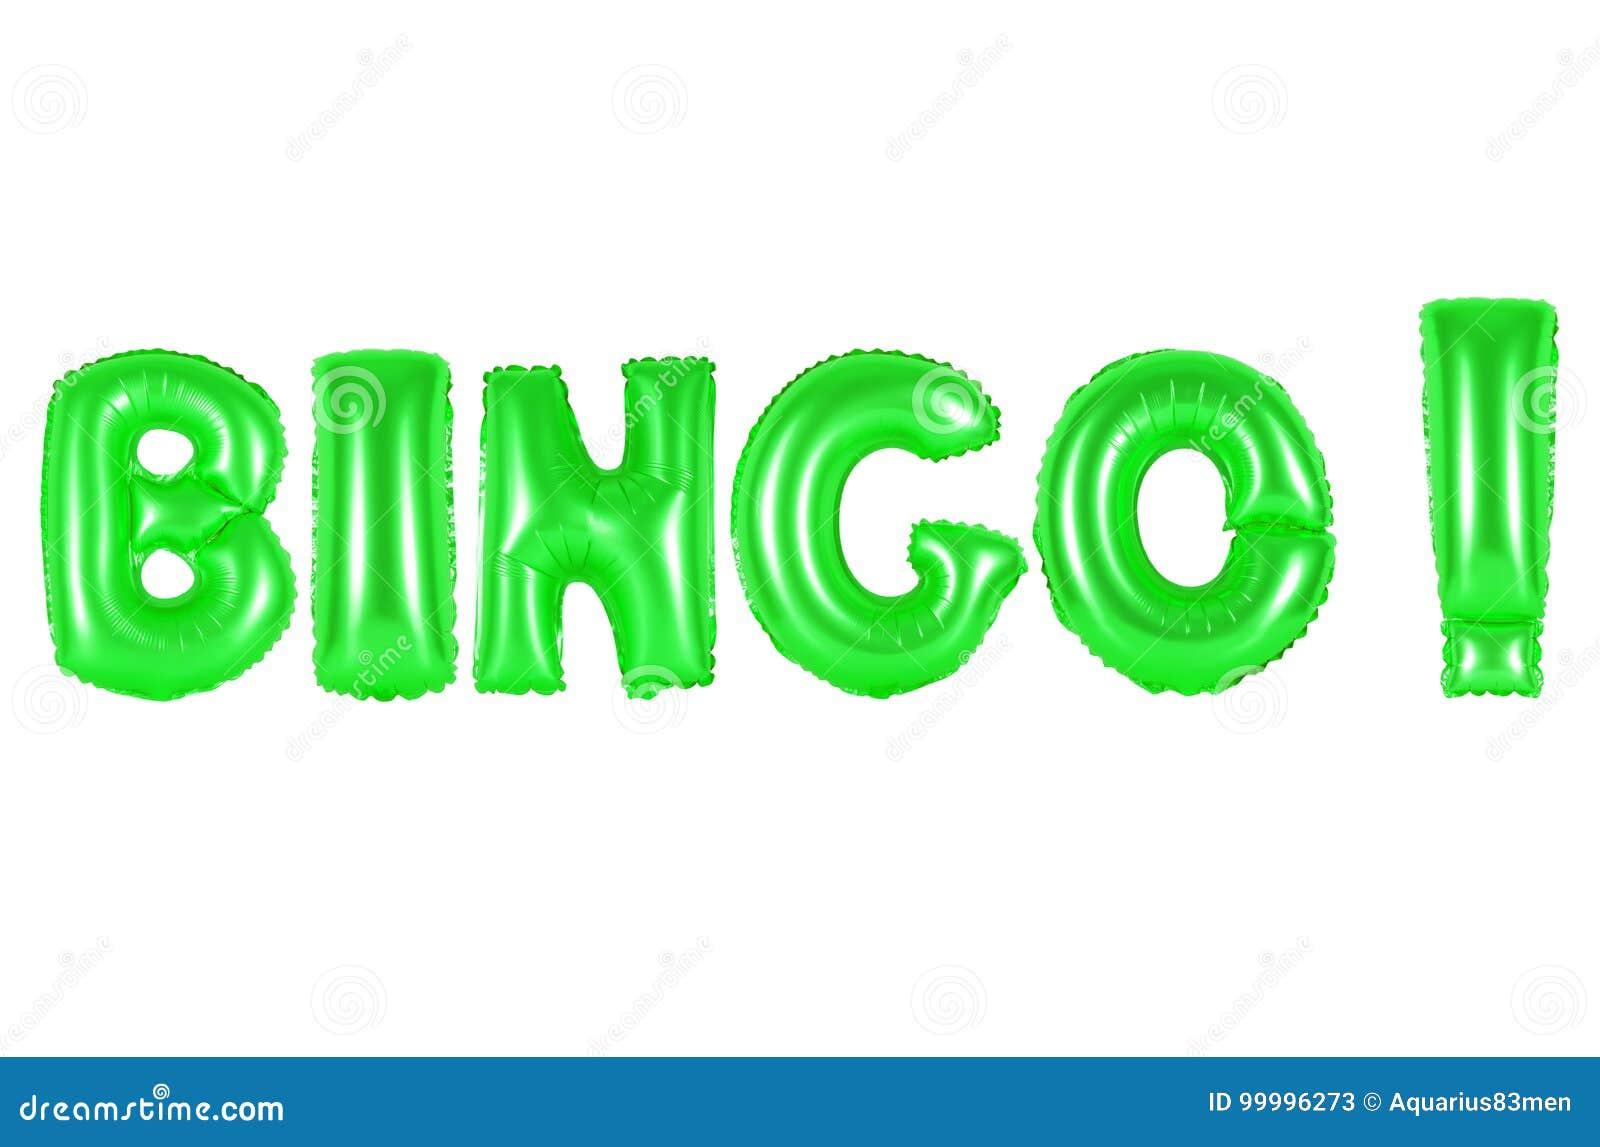 Bingo, green color stock image. Image of foil, concepts - 99996273